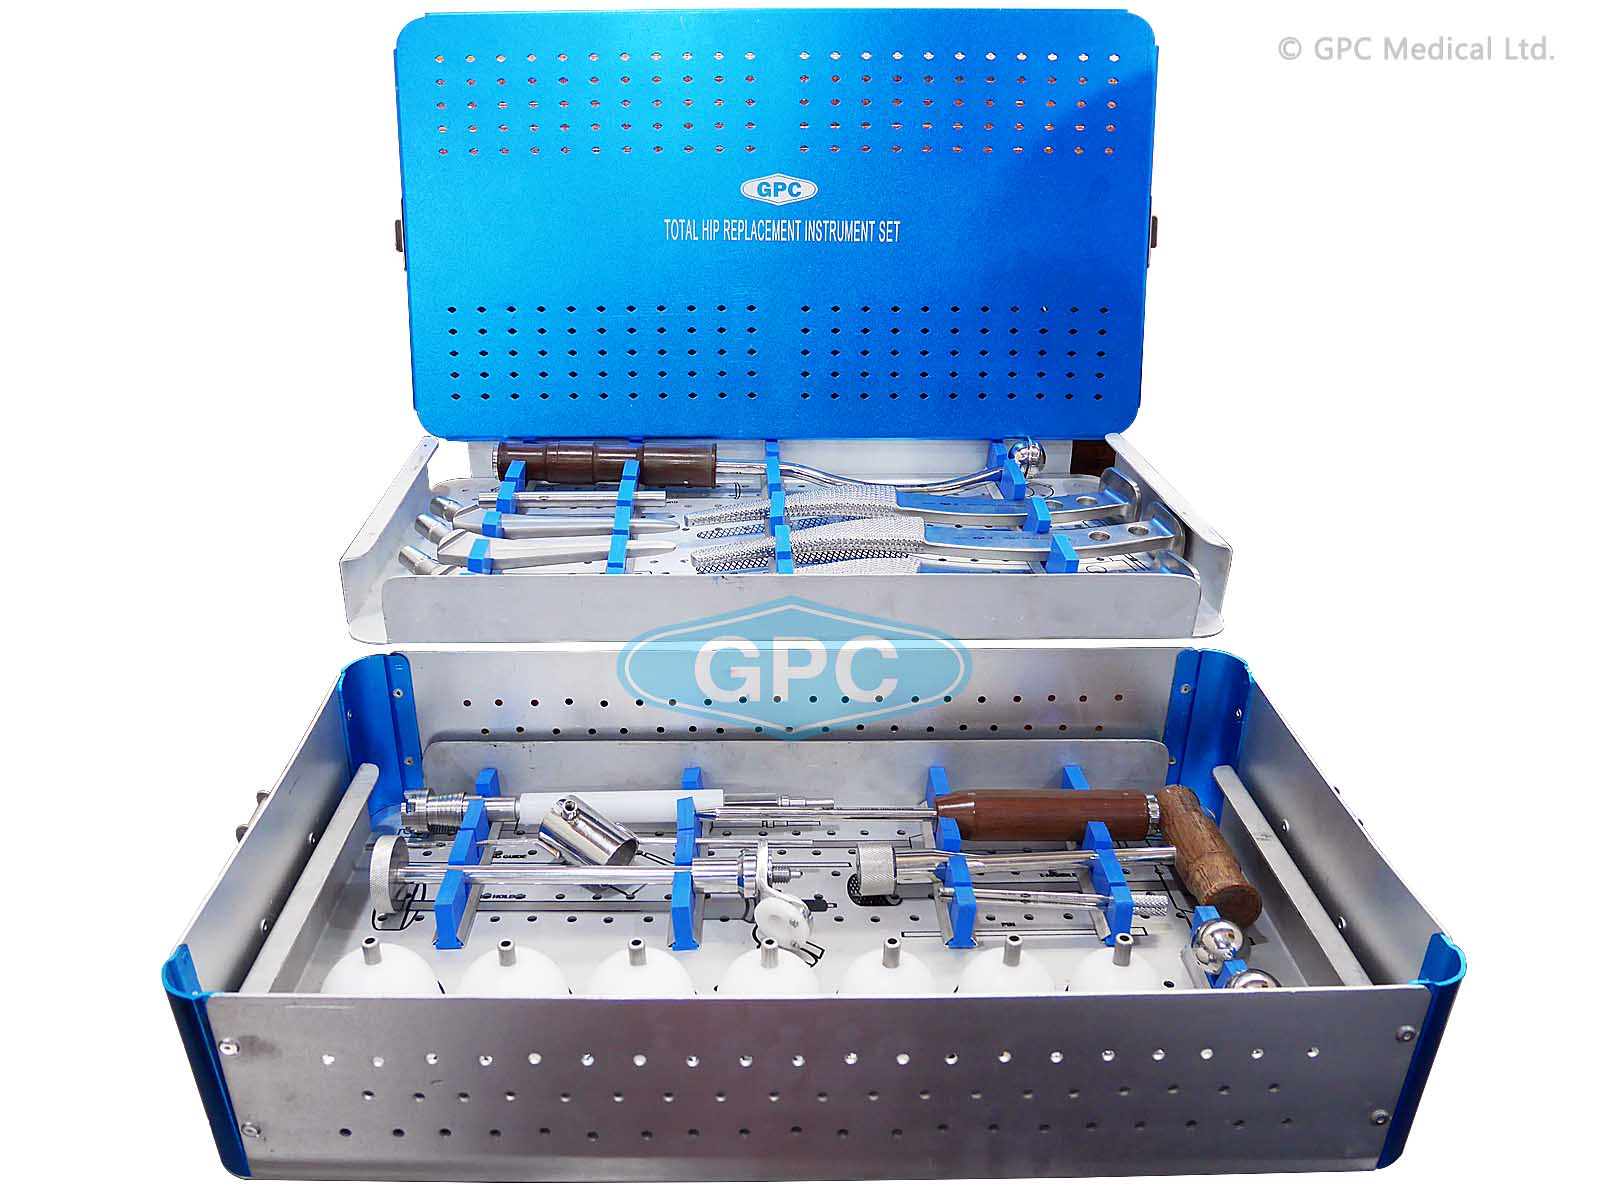 Instrument Set for Total Arthroplasty